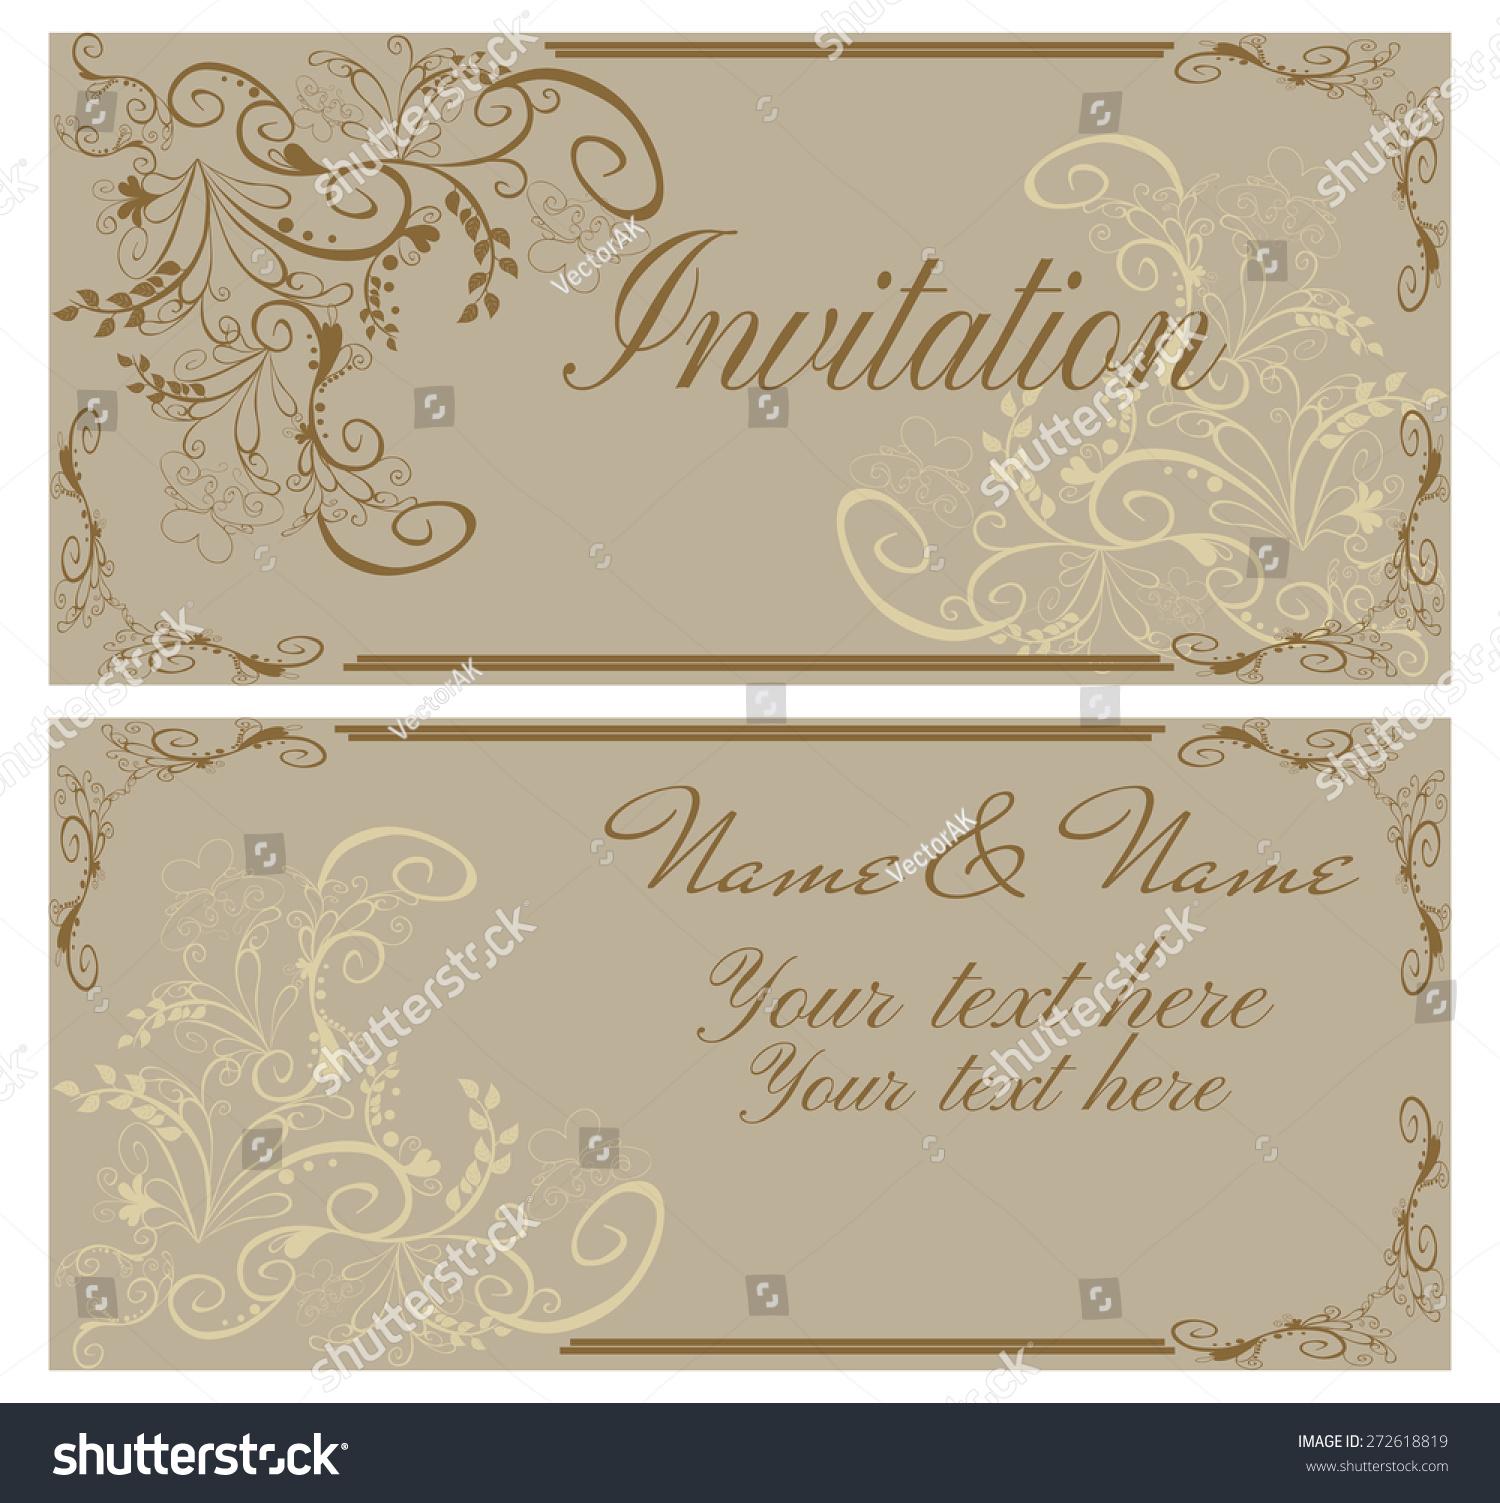 Vector Illustration Vintage Invitation Card Wedding Stock Vector ...